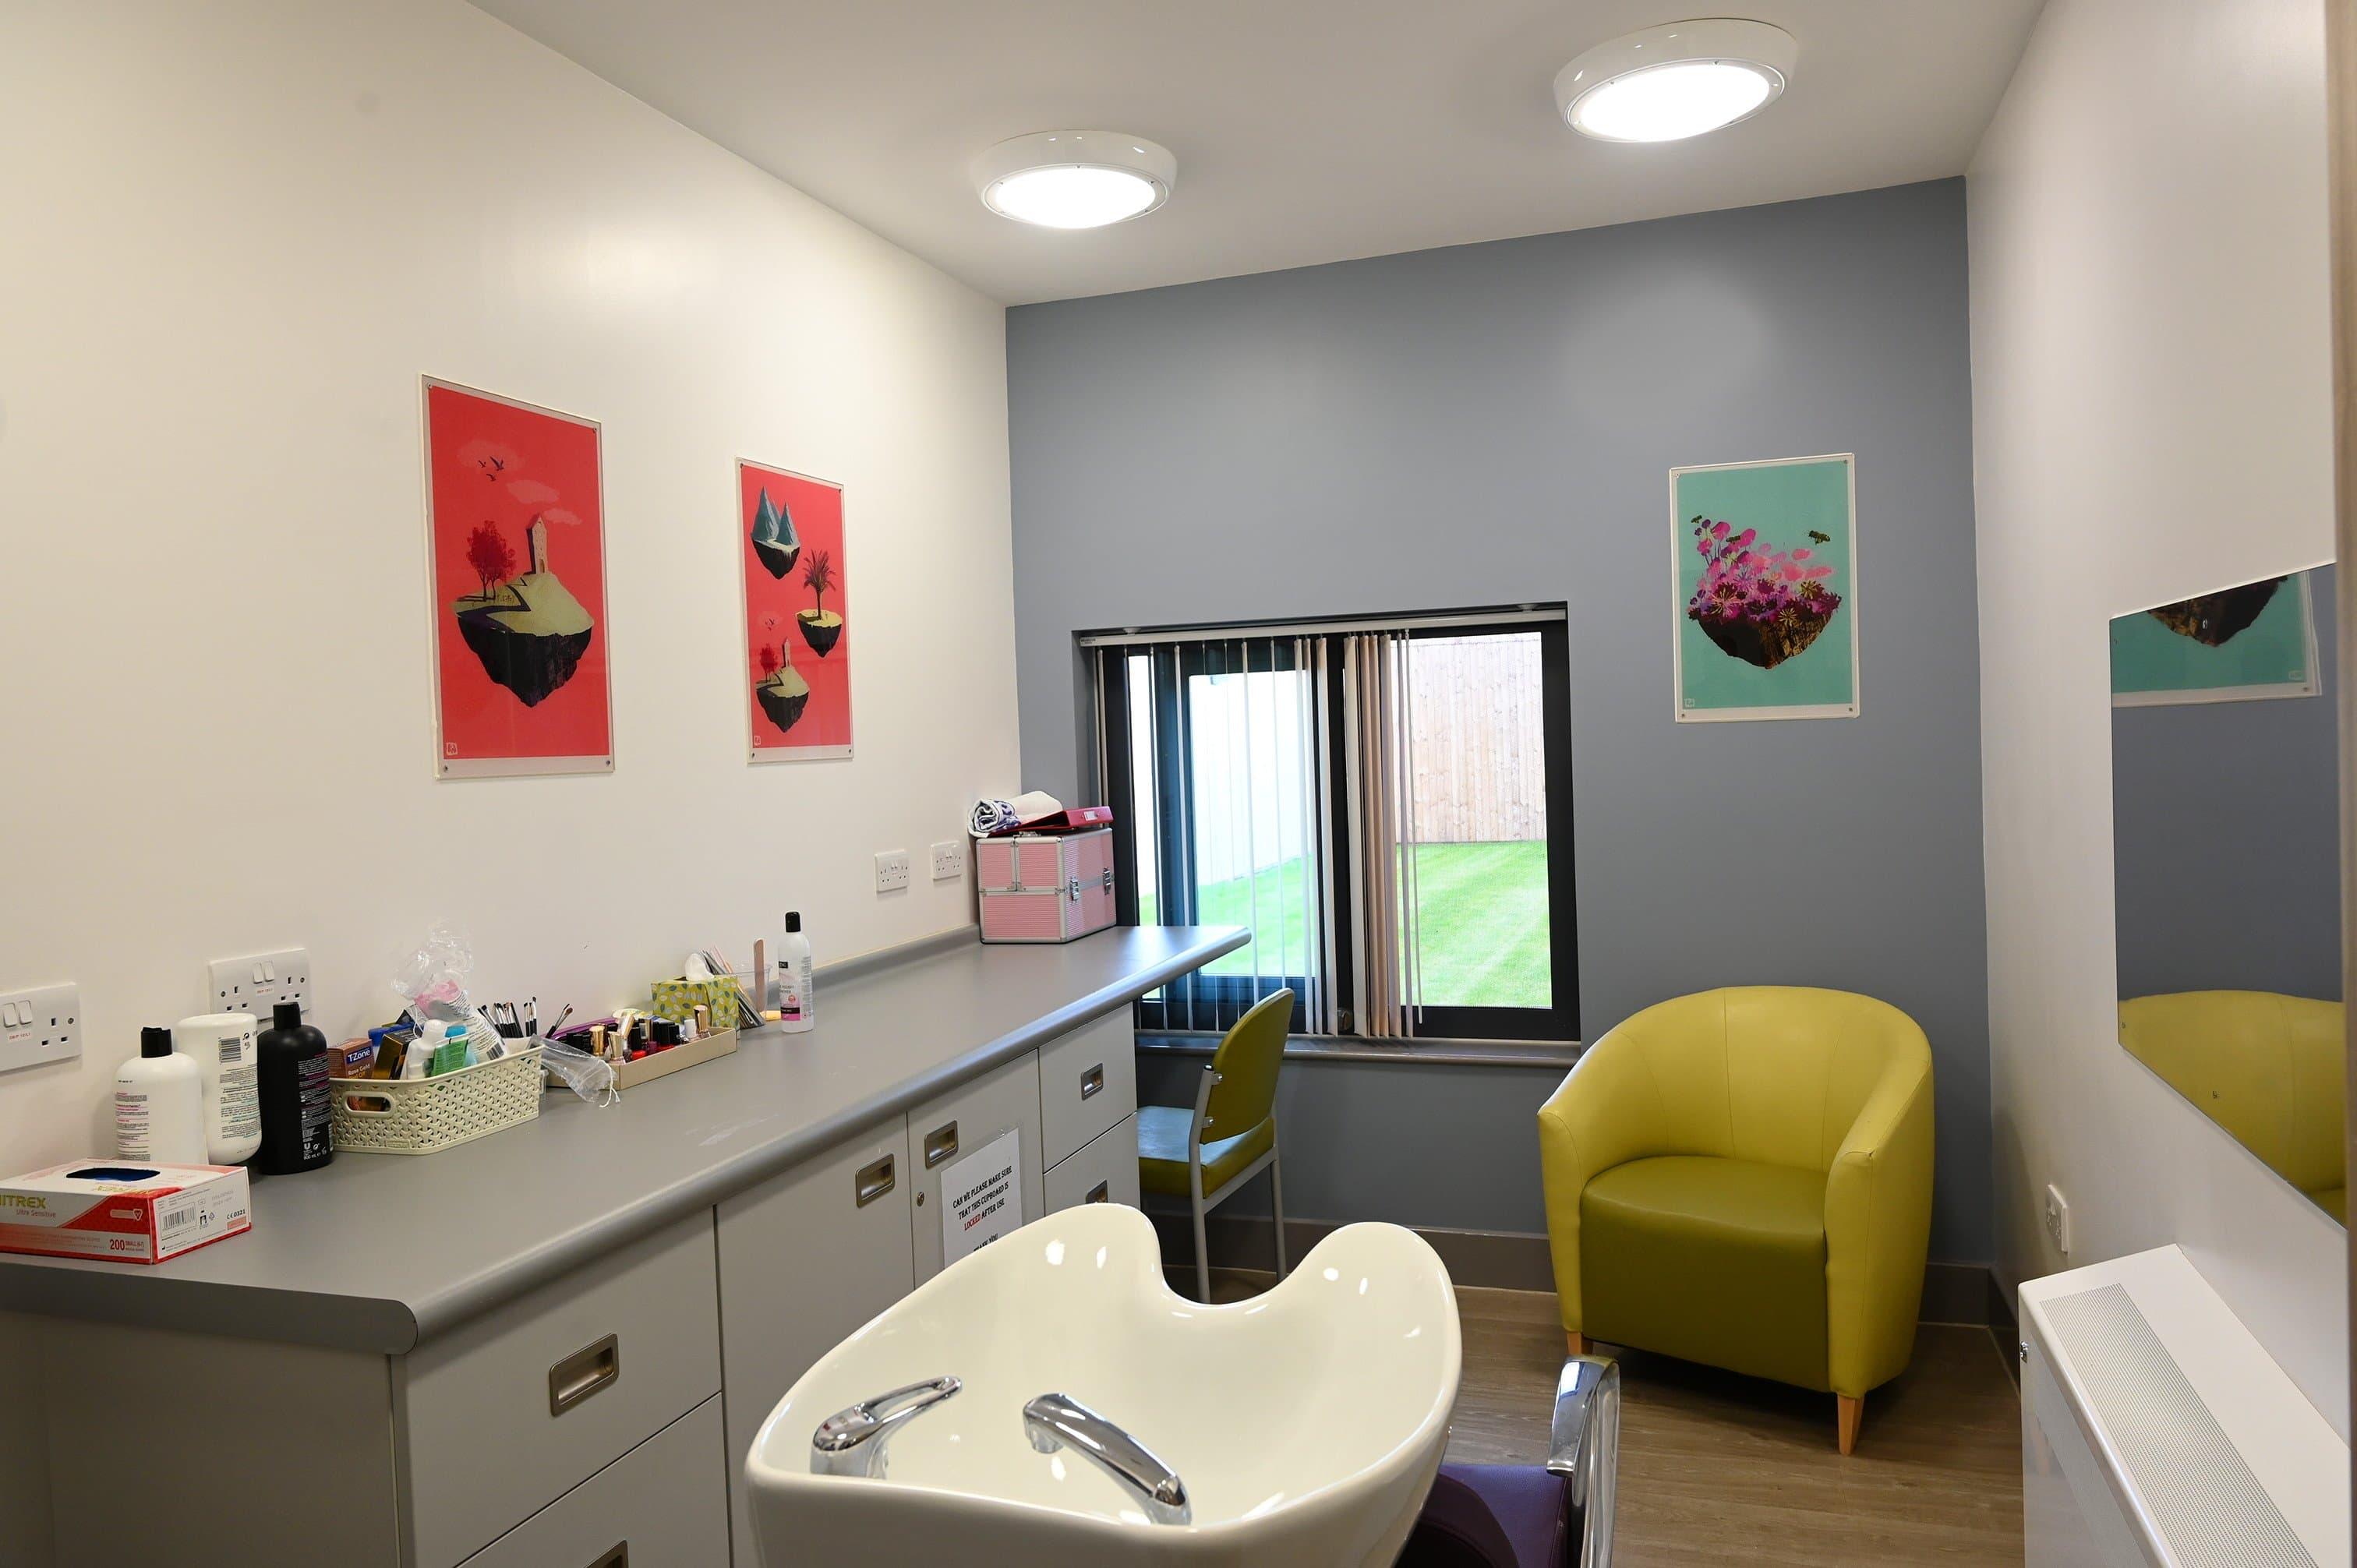 Honeysuckle Lodge - Complementary Room (2)